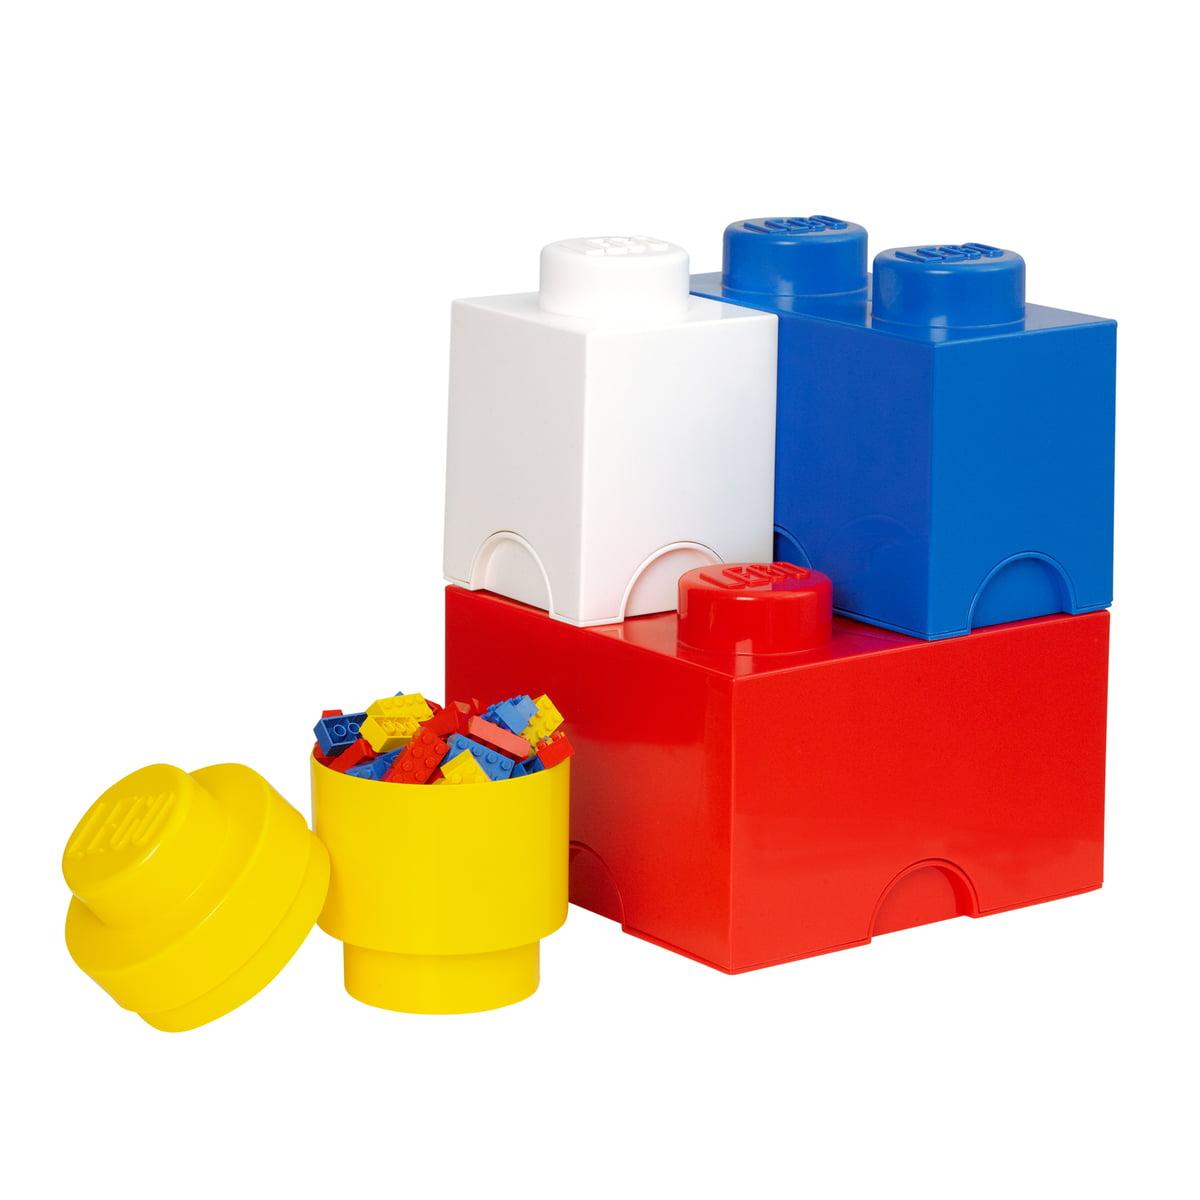 Storage Brick Multipack set of 4 by Lego